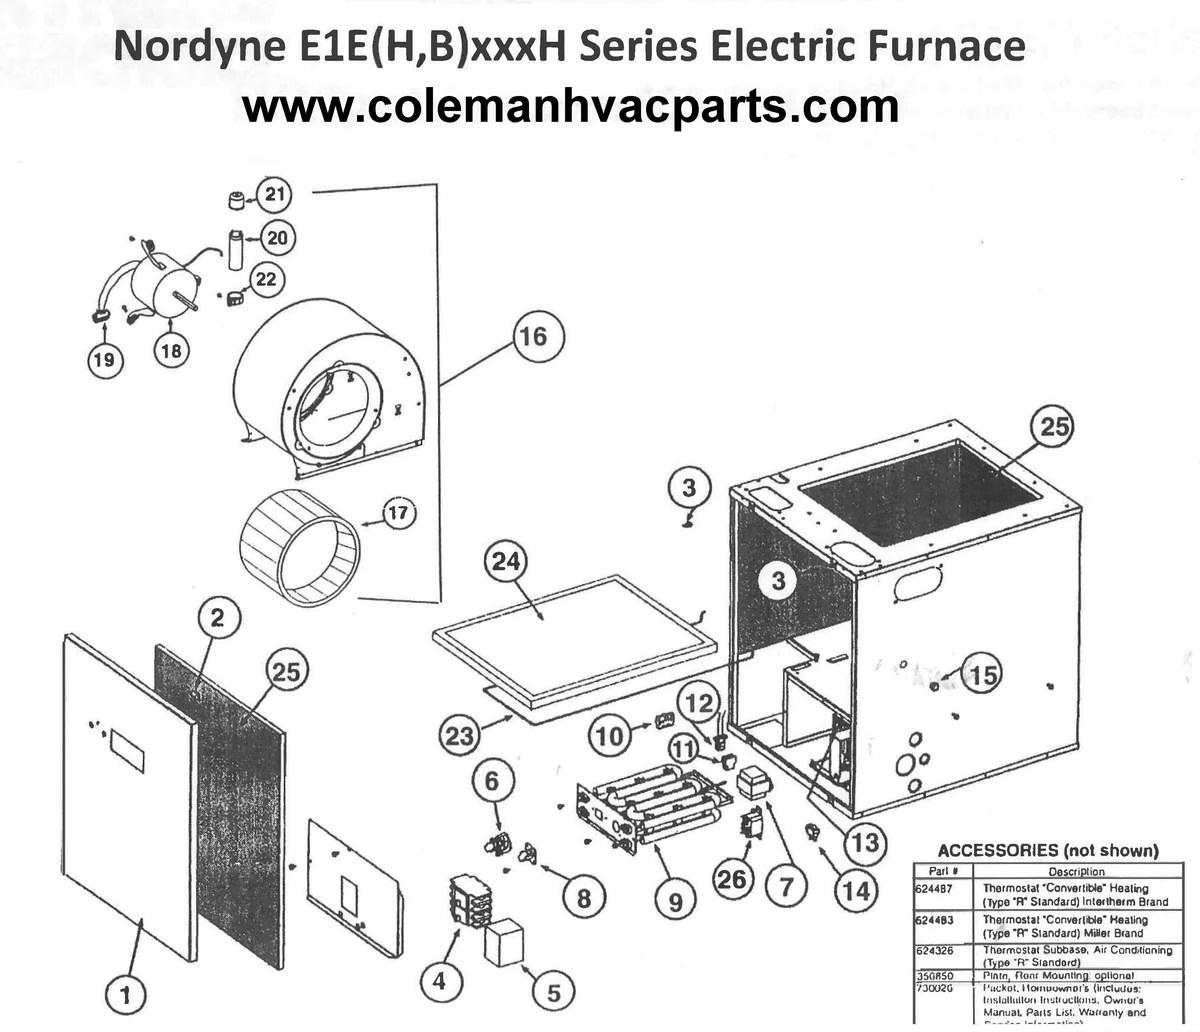 e1eh012h nordyne electric furnace parts hvacpartstore coleman furnace parts miller furnace parts diagram [ 1199 x 1032 Pixel ]